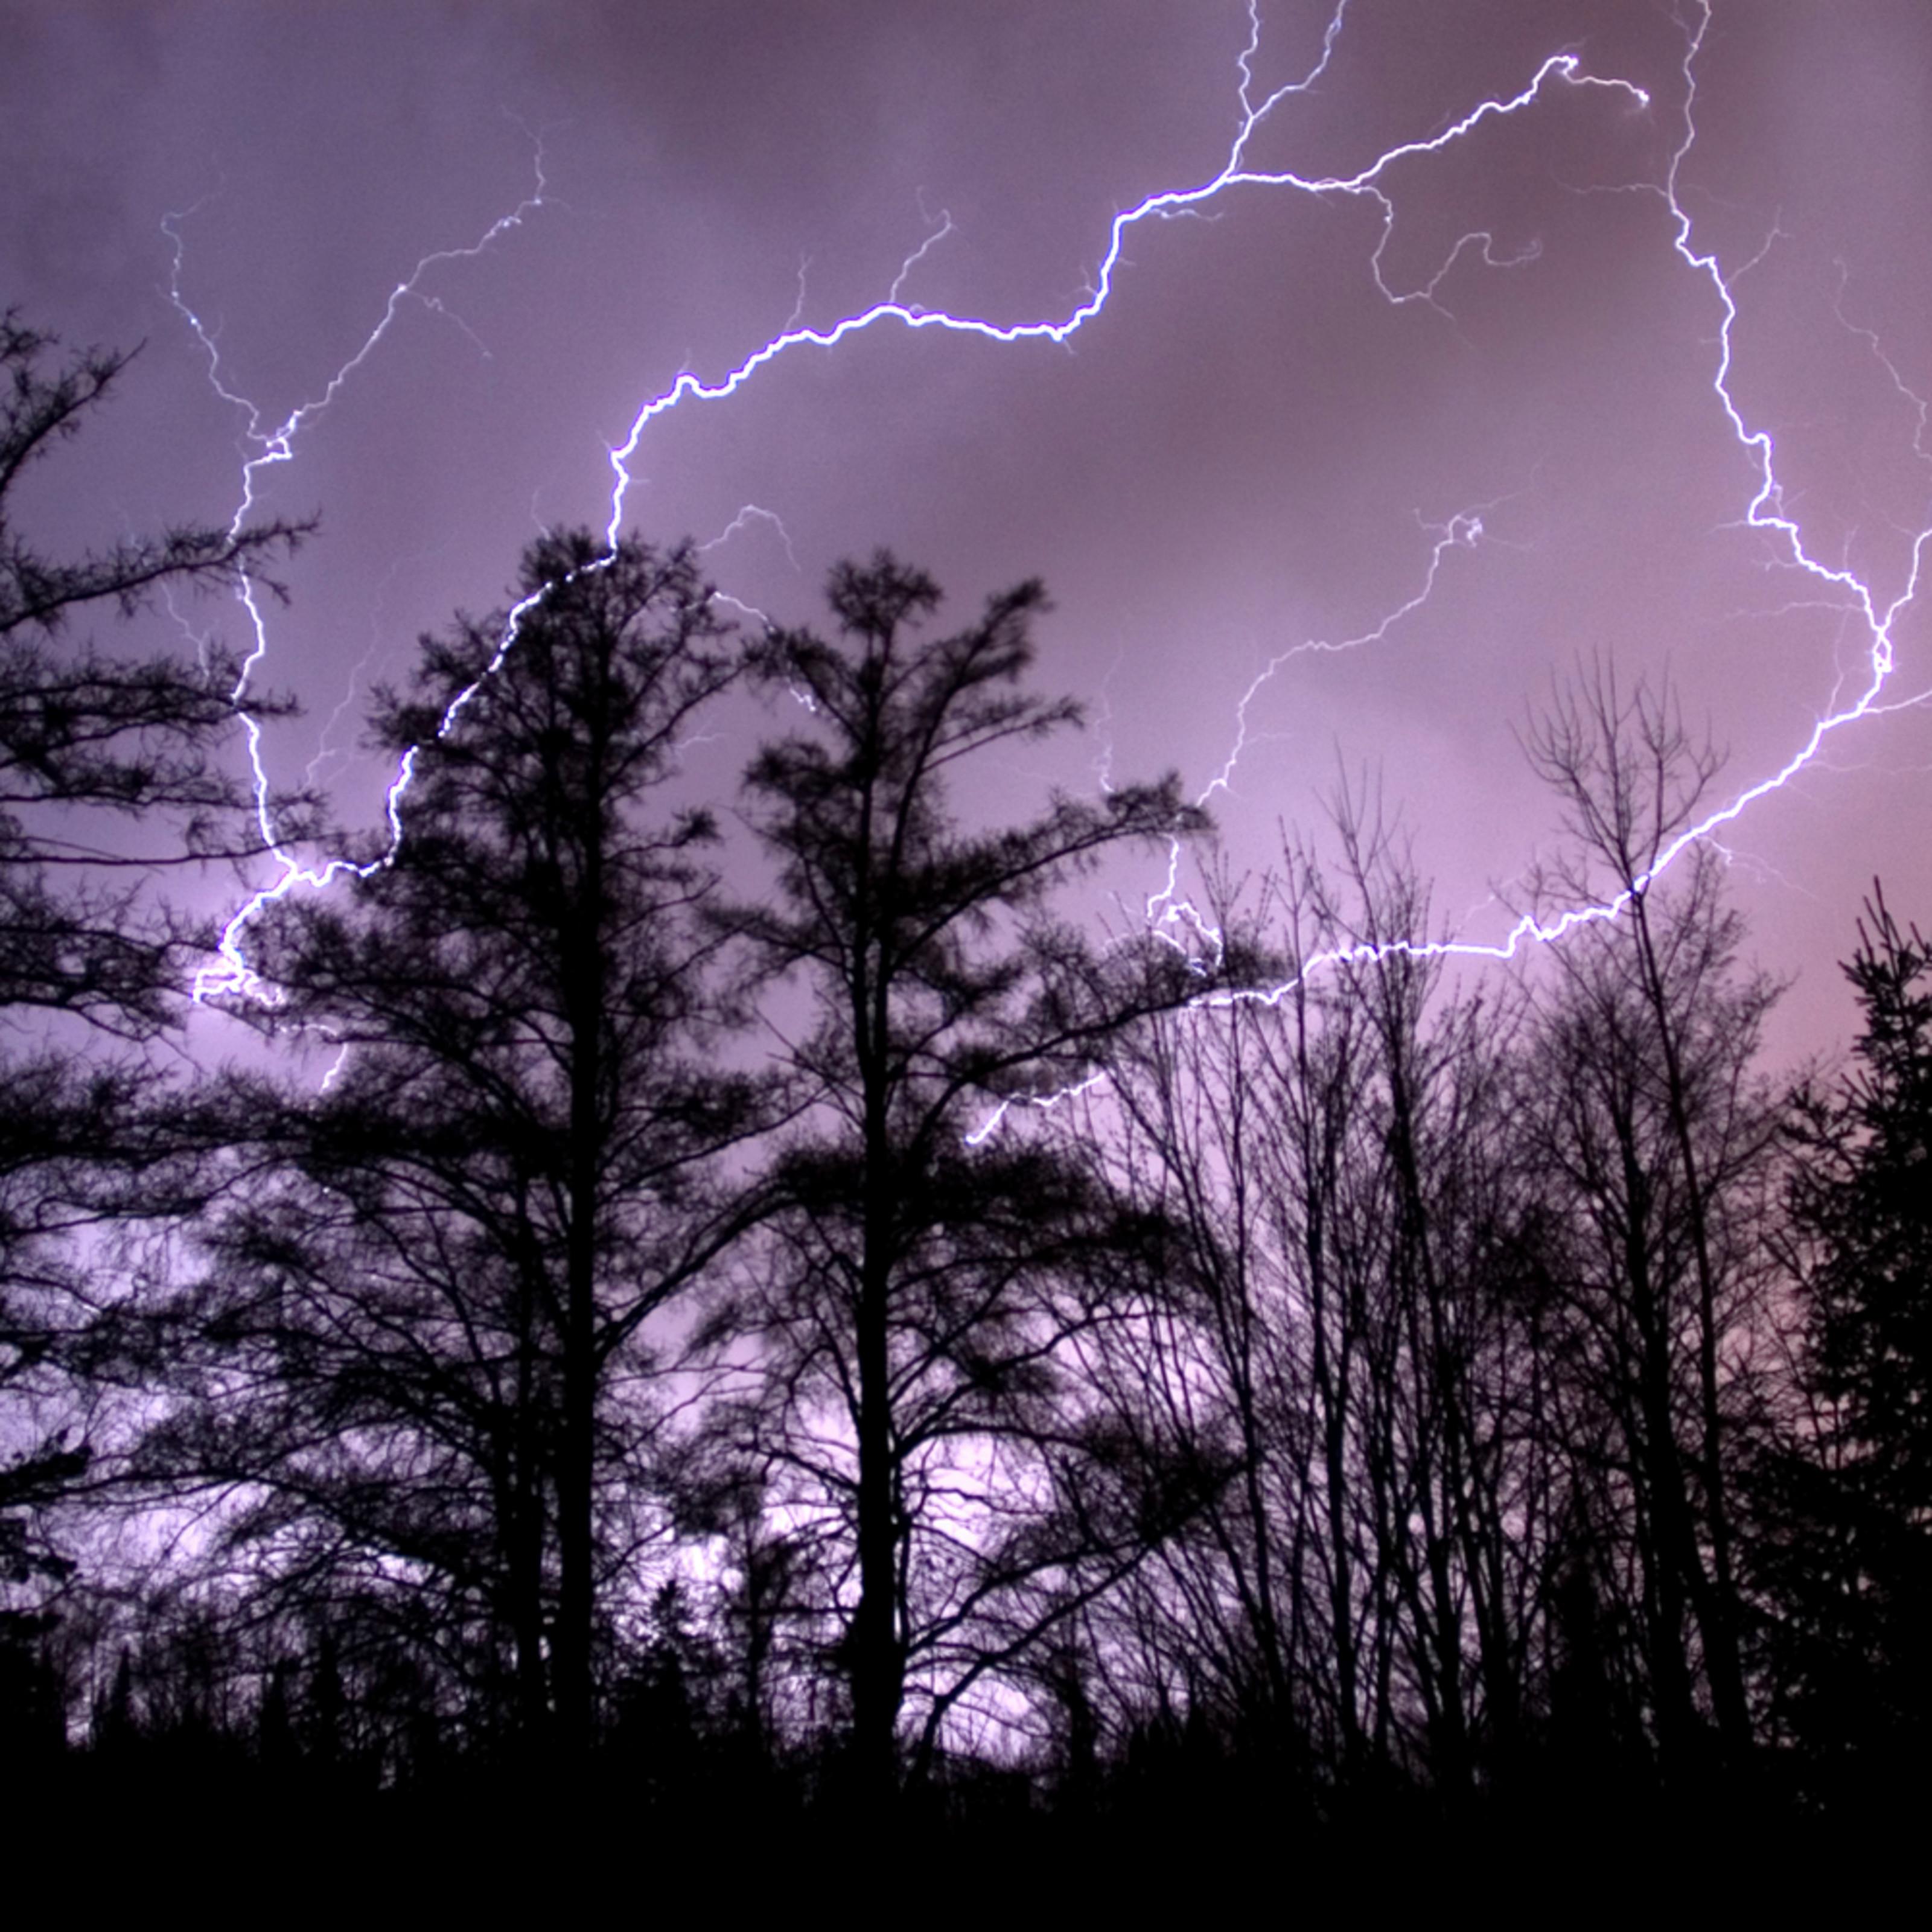 Lightning iwfihg